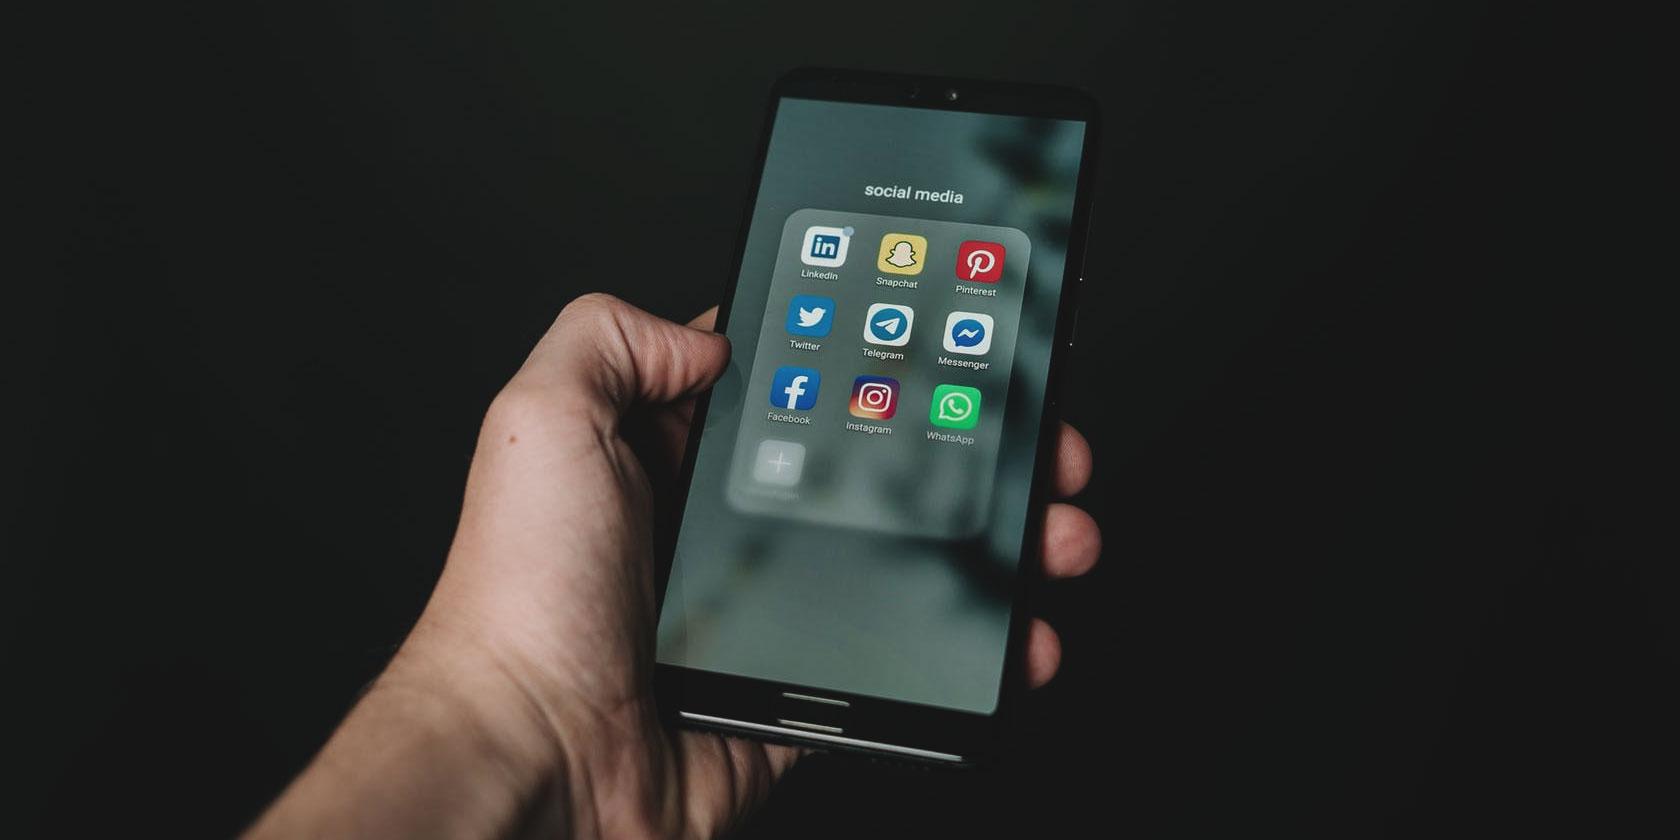 social-media-pros-cons